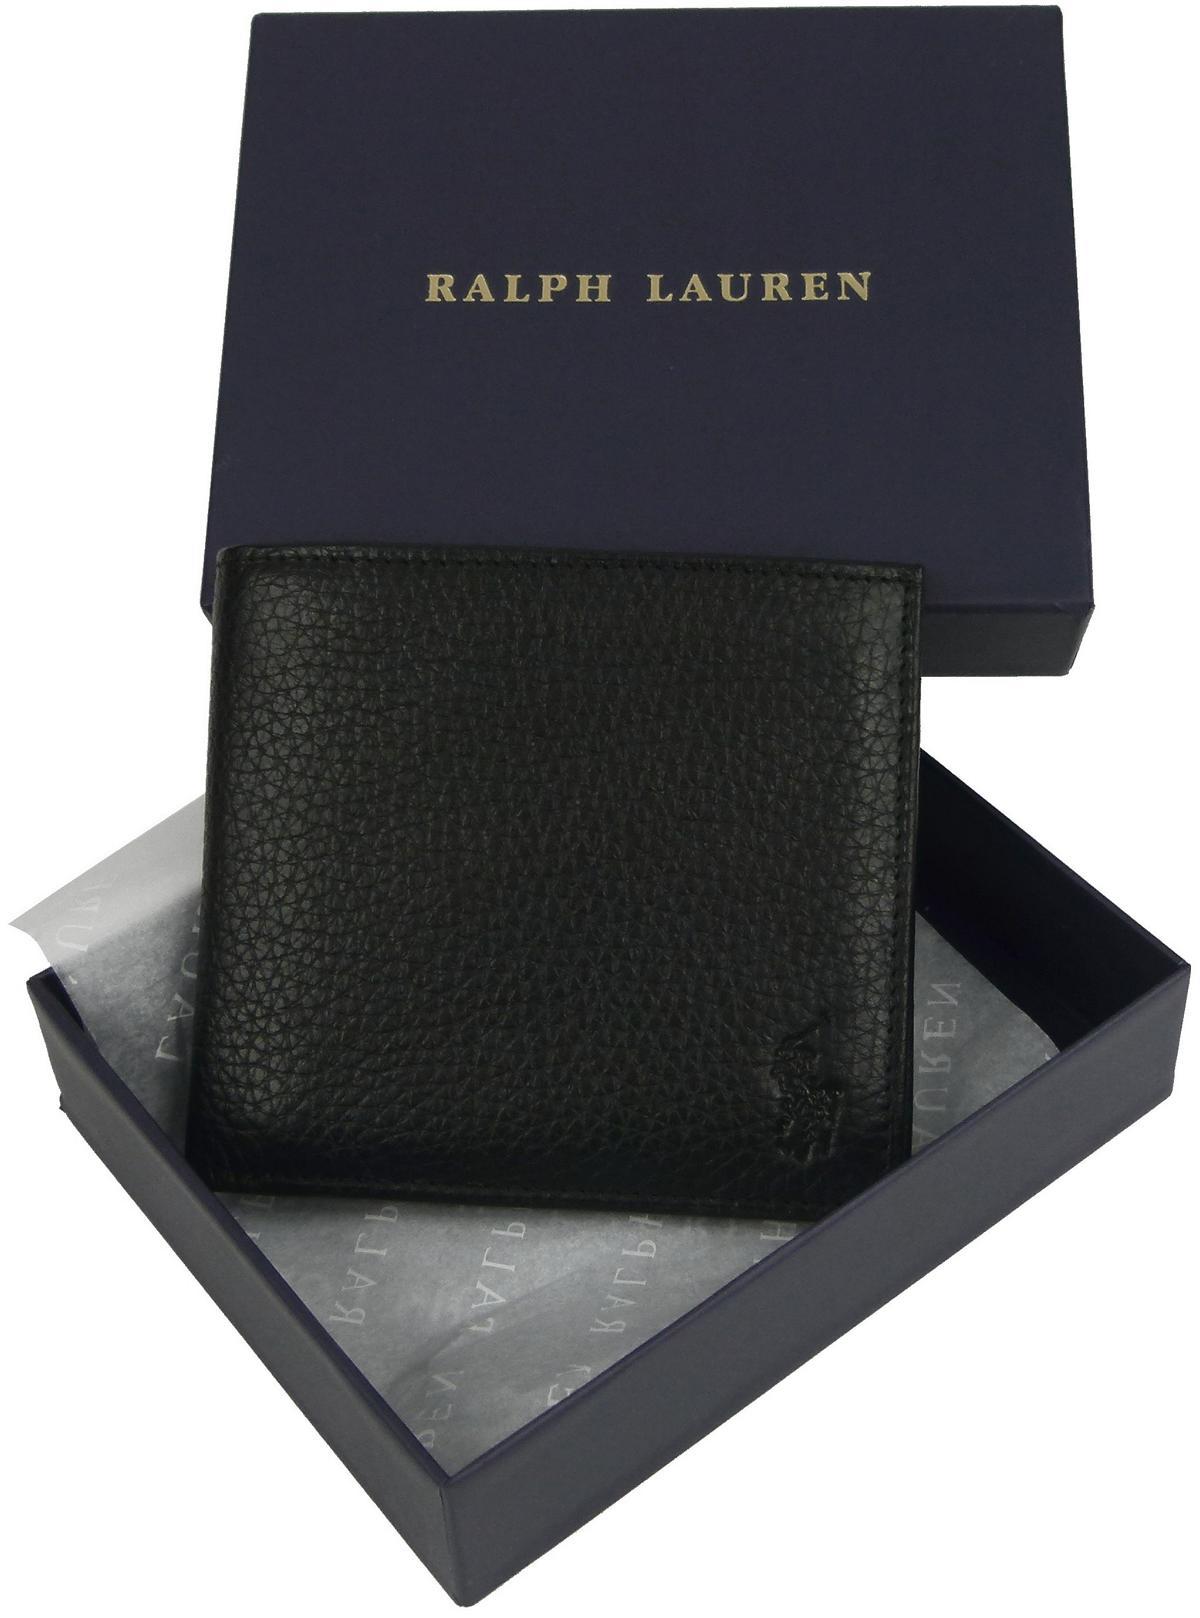 wholesale price new specials hot products ralph lauren herren portemonnaie - WörterSee Public Relations